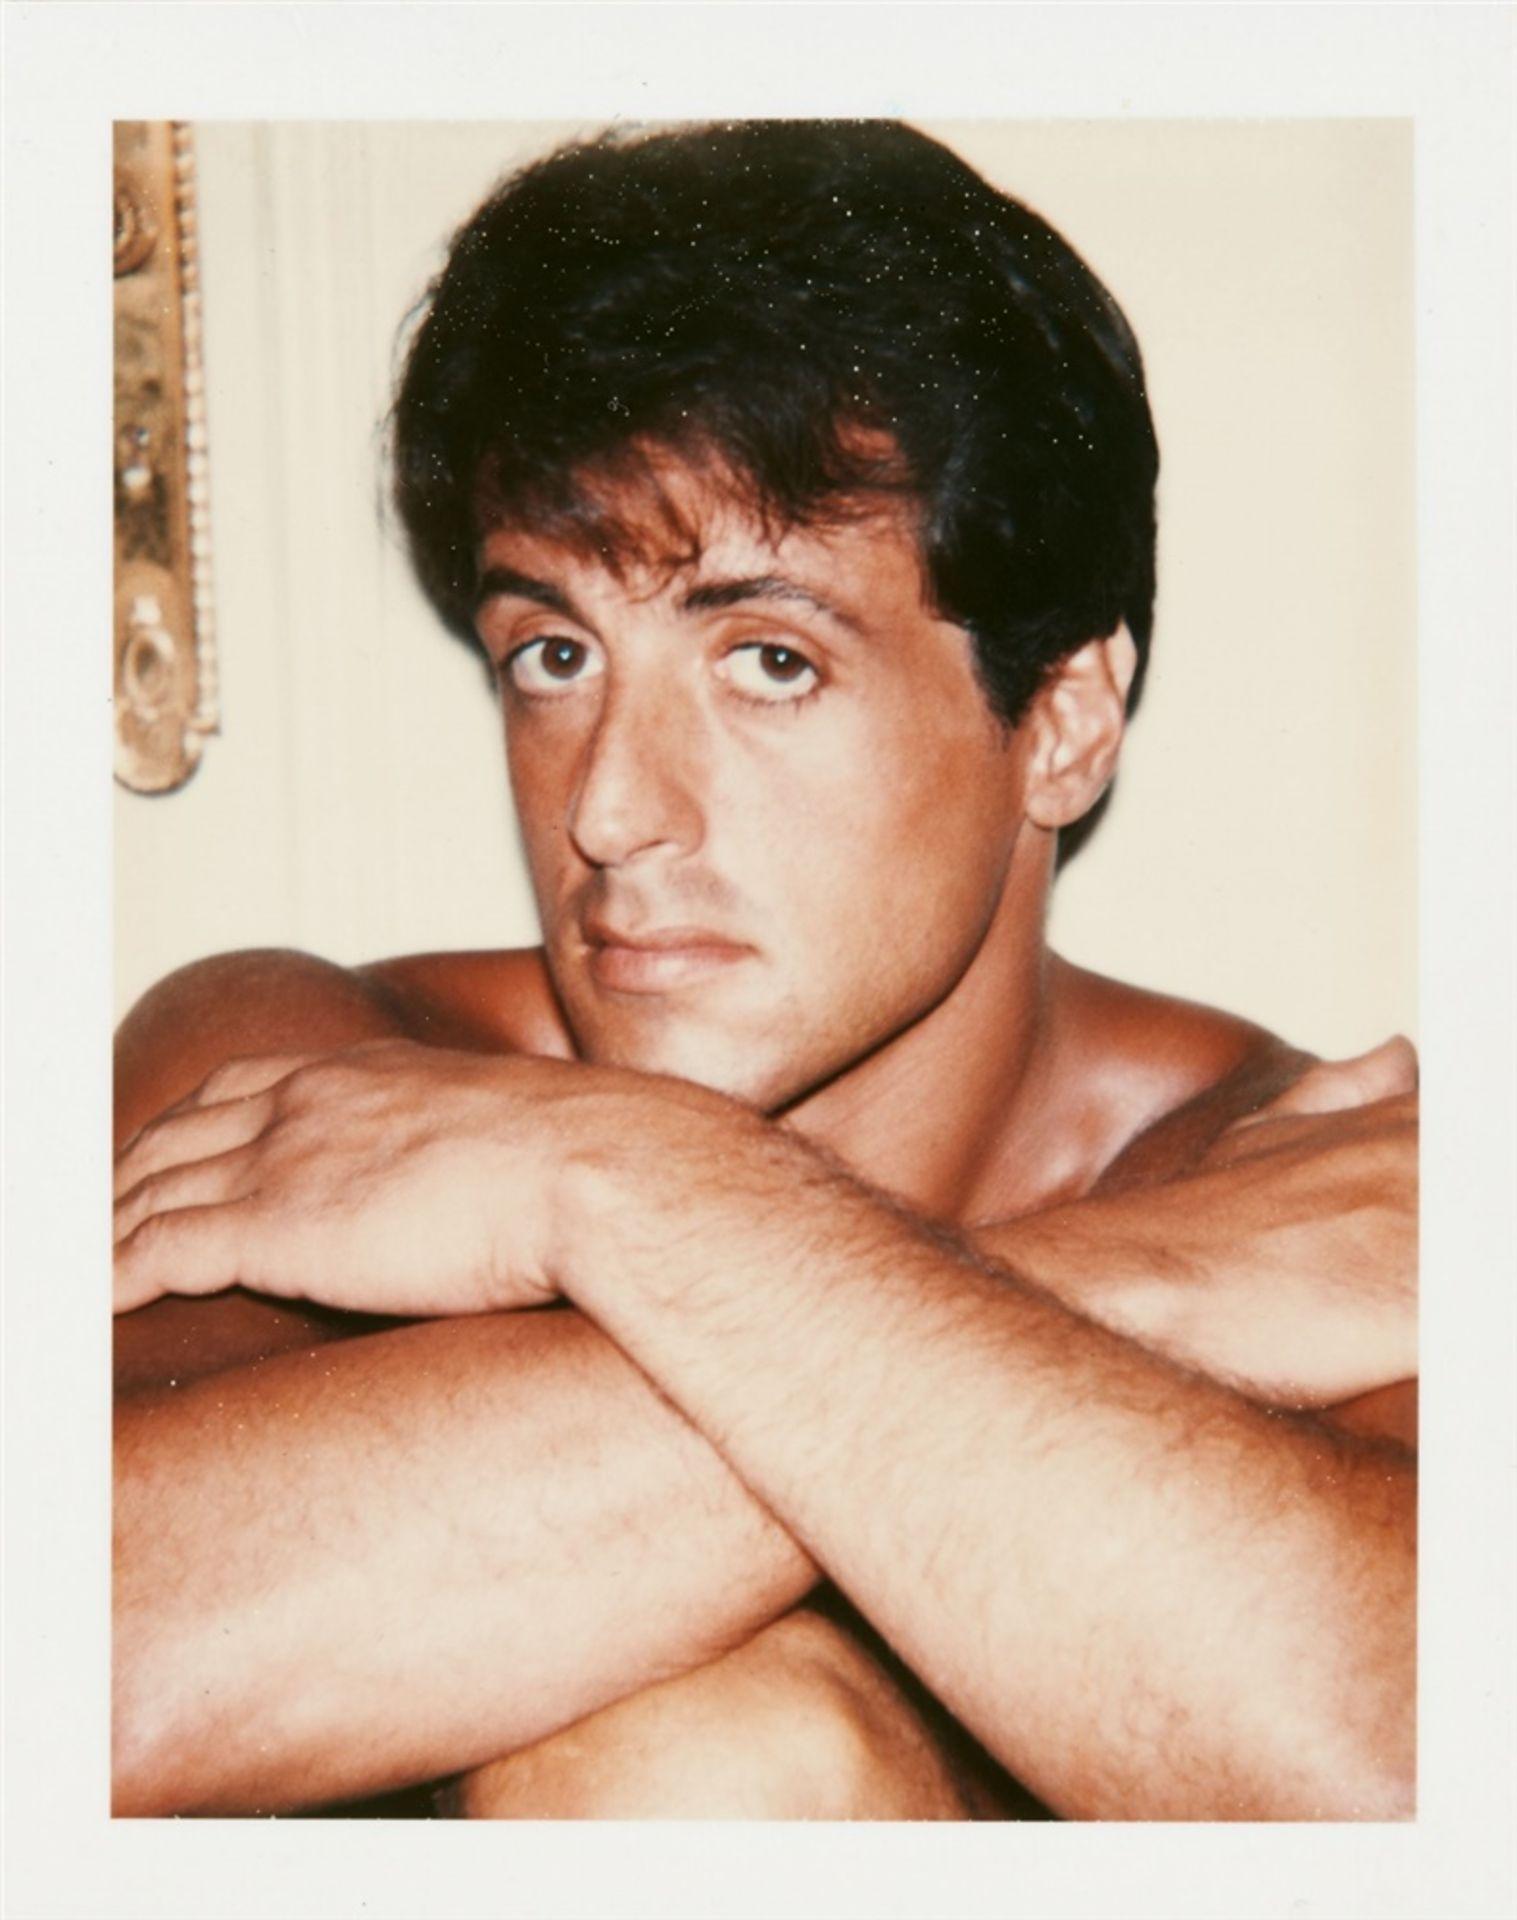 Andy WarholSylvester Stallone